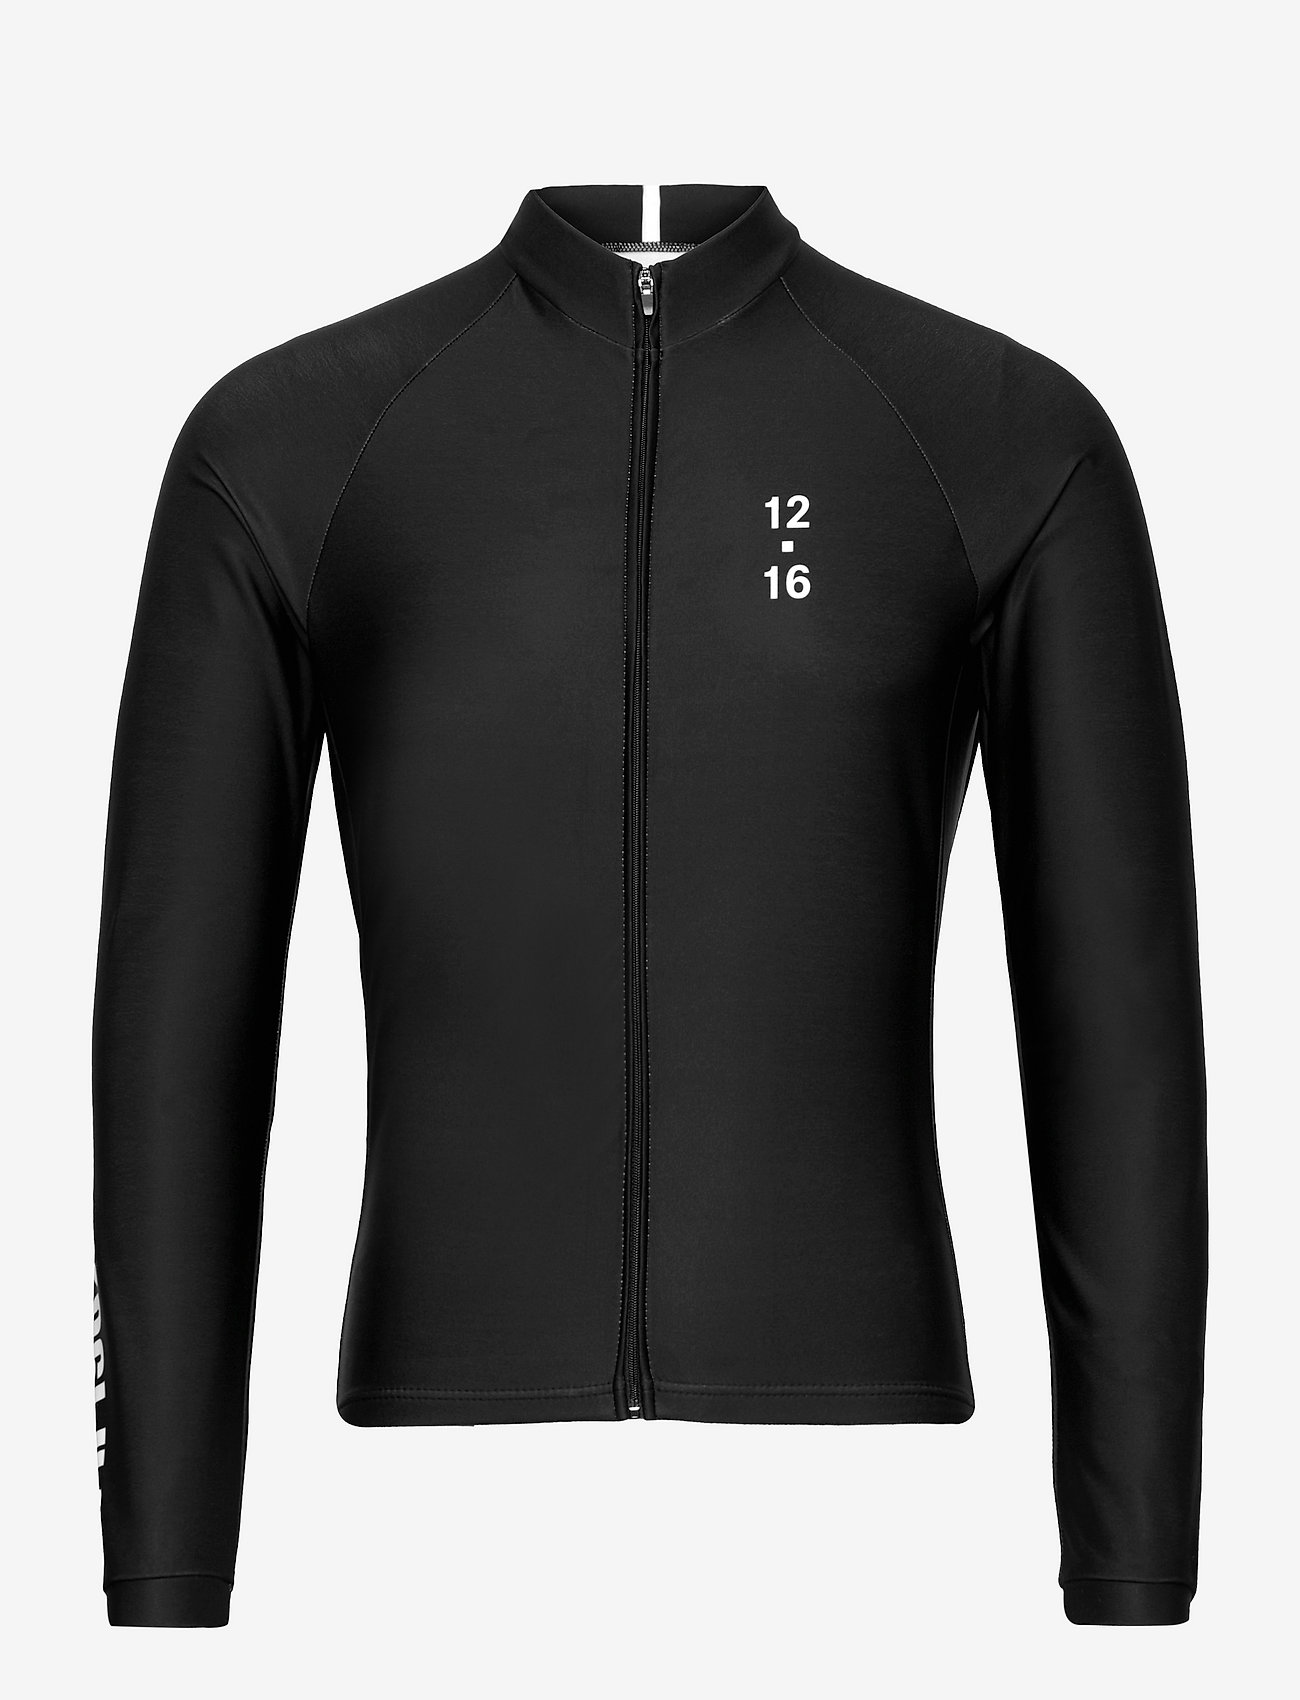 Twelve Sixteen - 0174 Jersey L/S Elite ANDORRA Black/White - overdele - black/white - 0